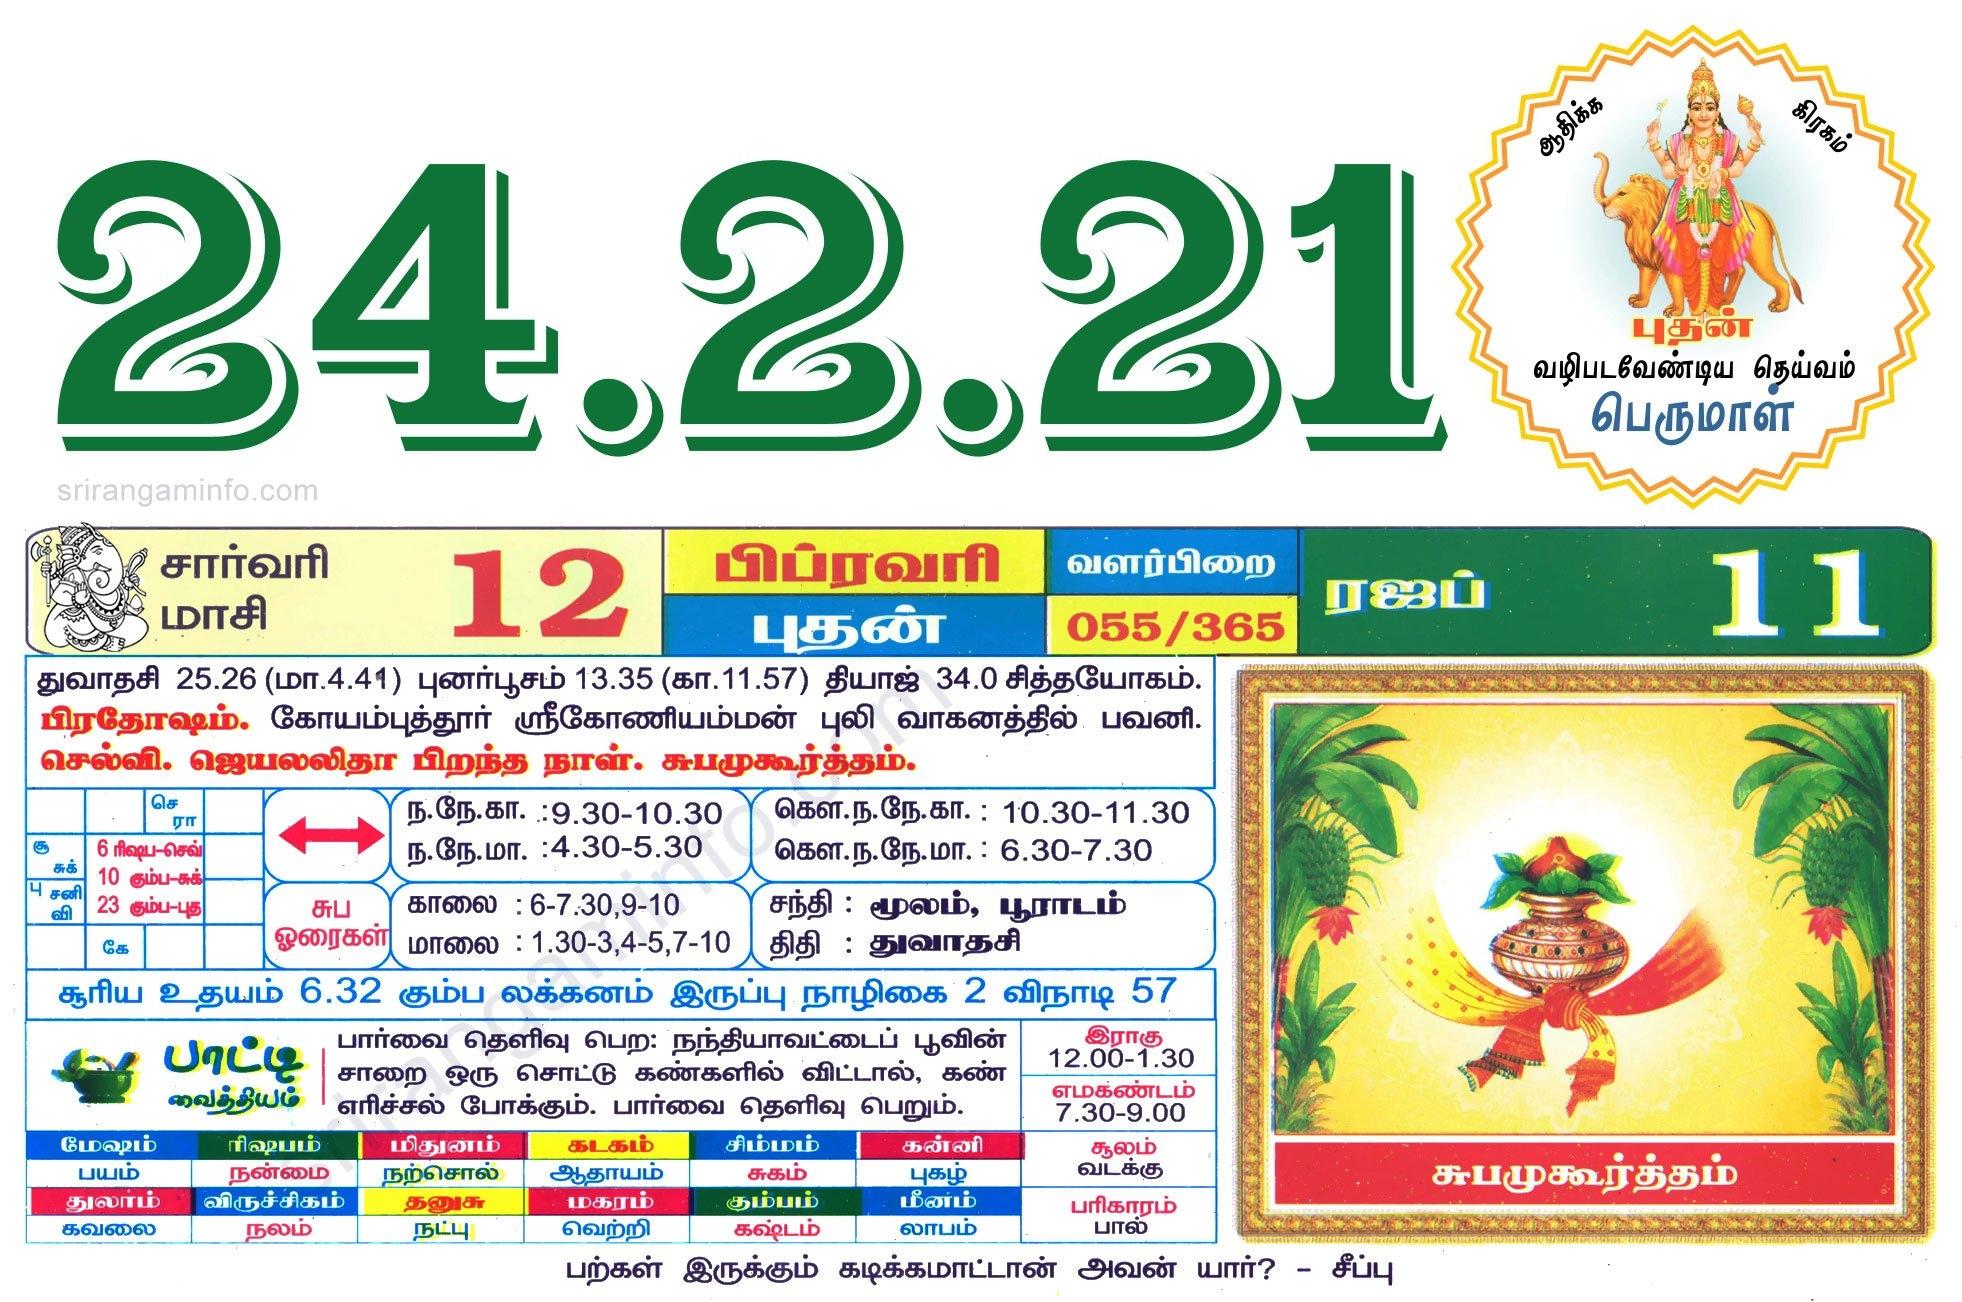 Tamil Daily Calendar 2021, Tamil Calendar 2021, Nalla Neram - தமிழ் தினசரி காலண்டர் with 2021 Tamil Calendar Holidays Image